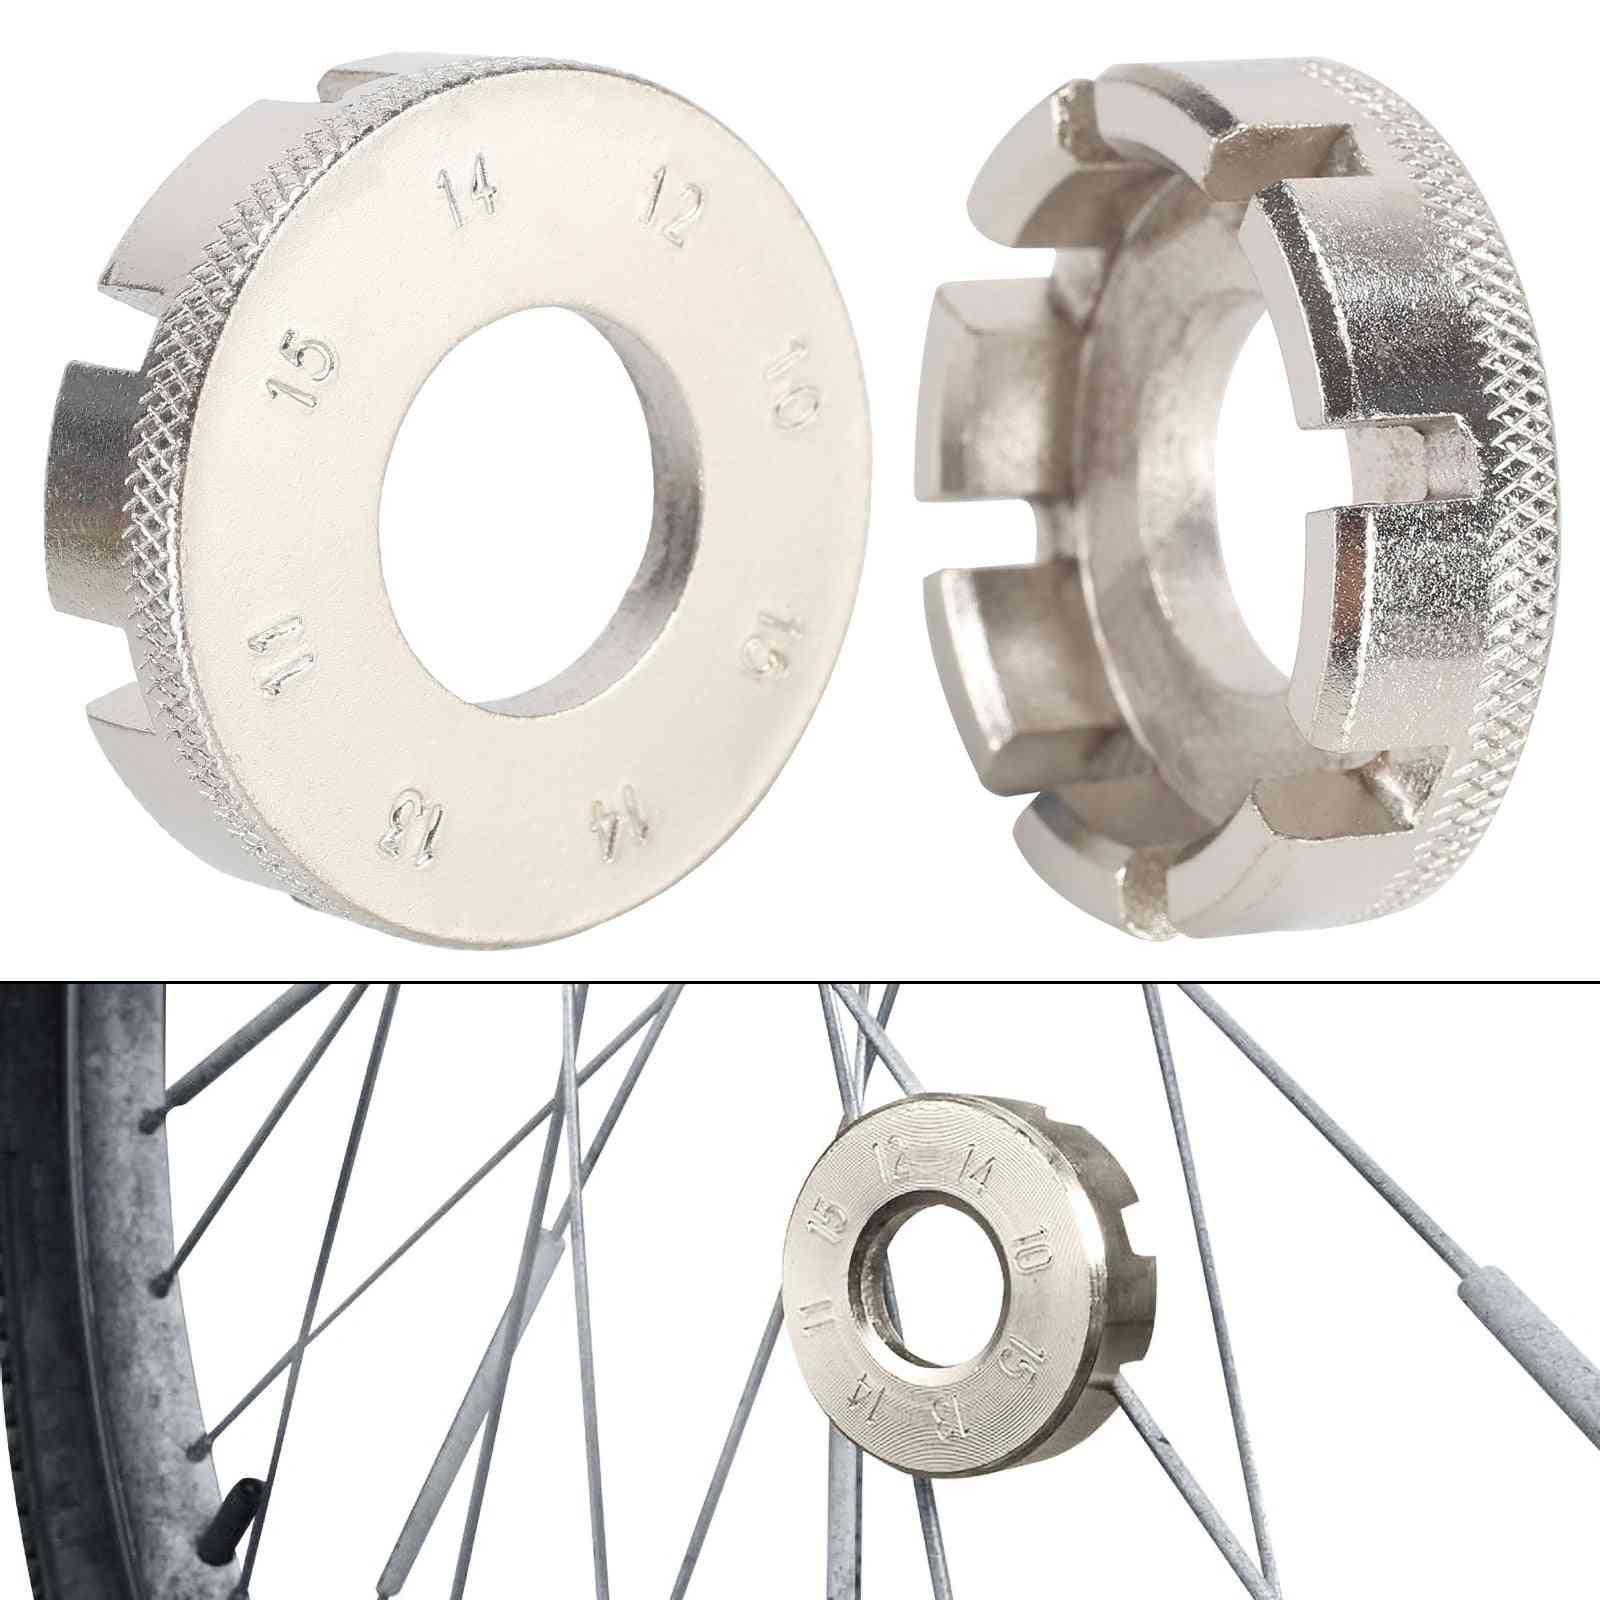 Multi-function 8-way Spoke Wrench- Repair Tool For Bicycle/bike